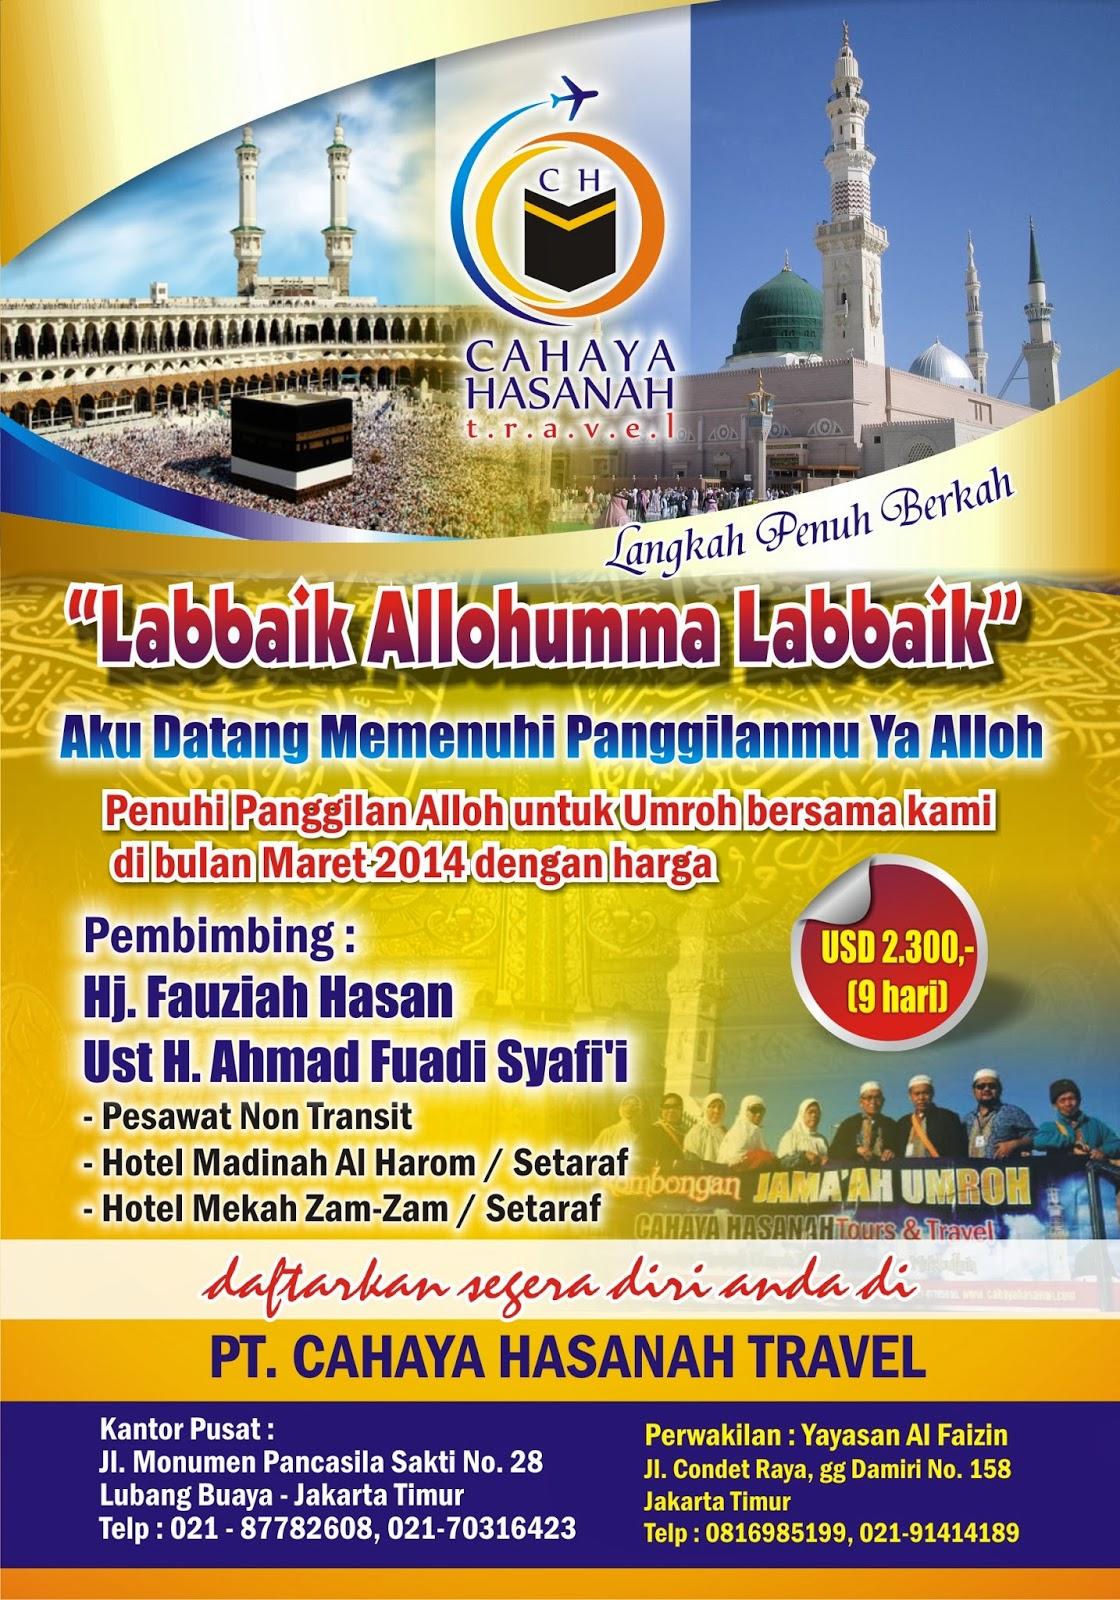 Desain Brosur Umrah Haji